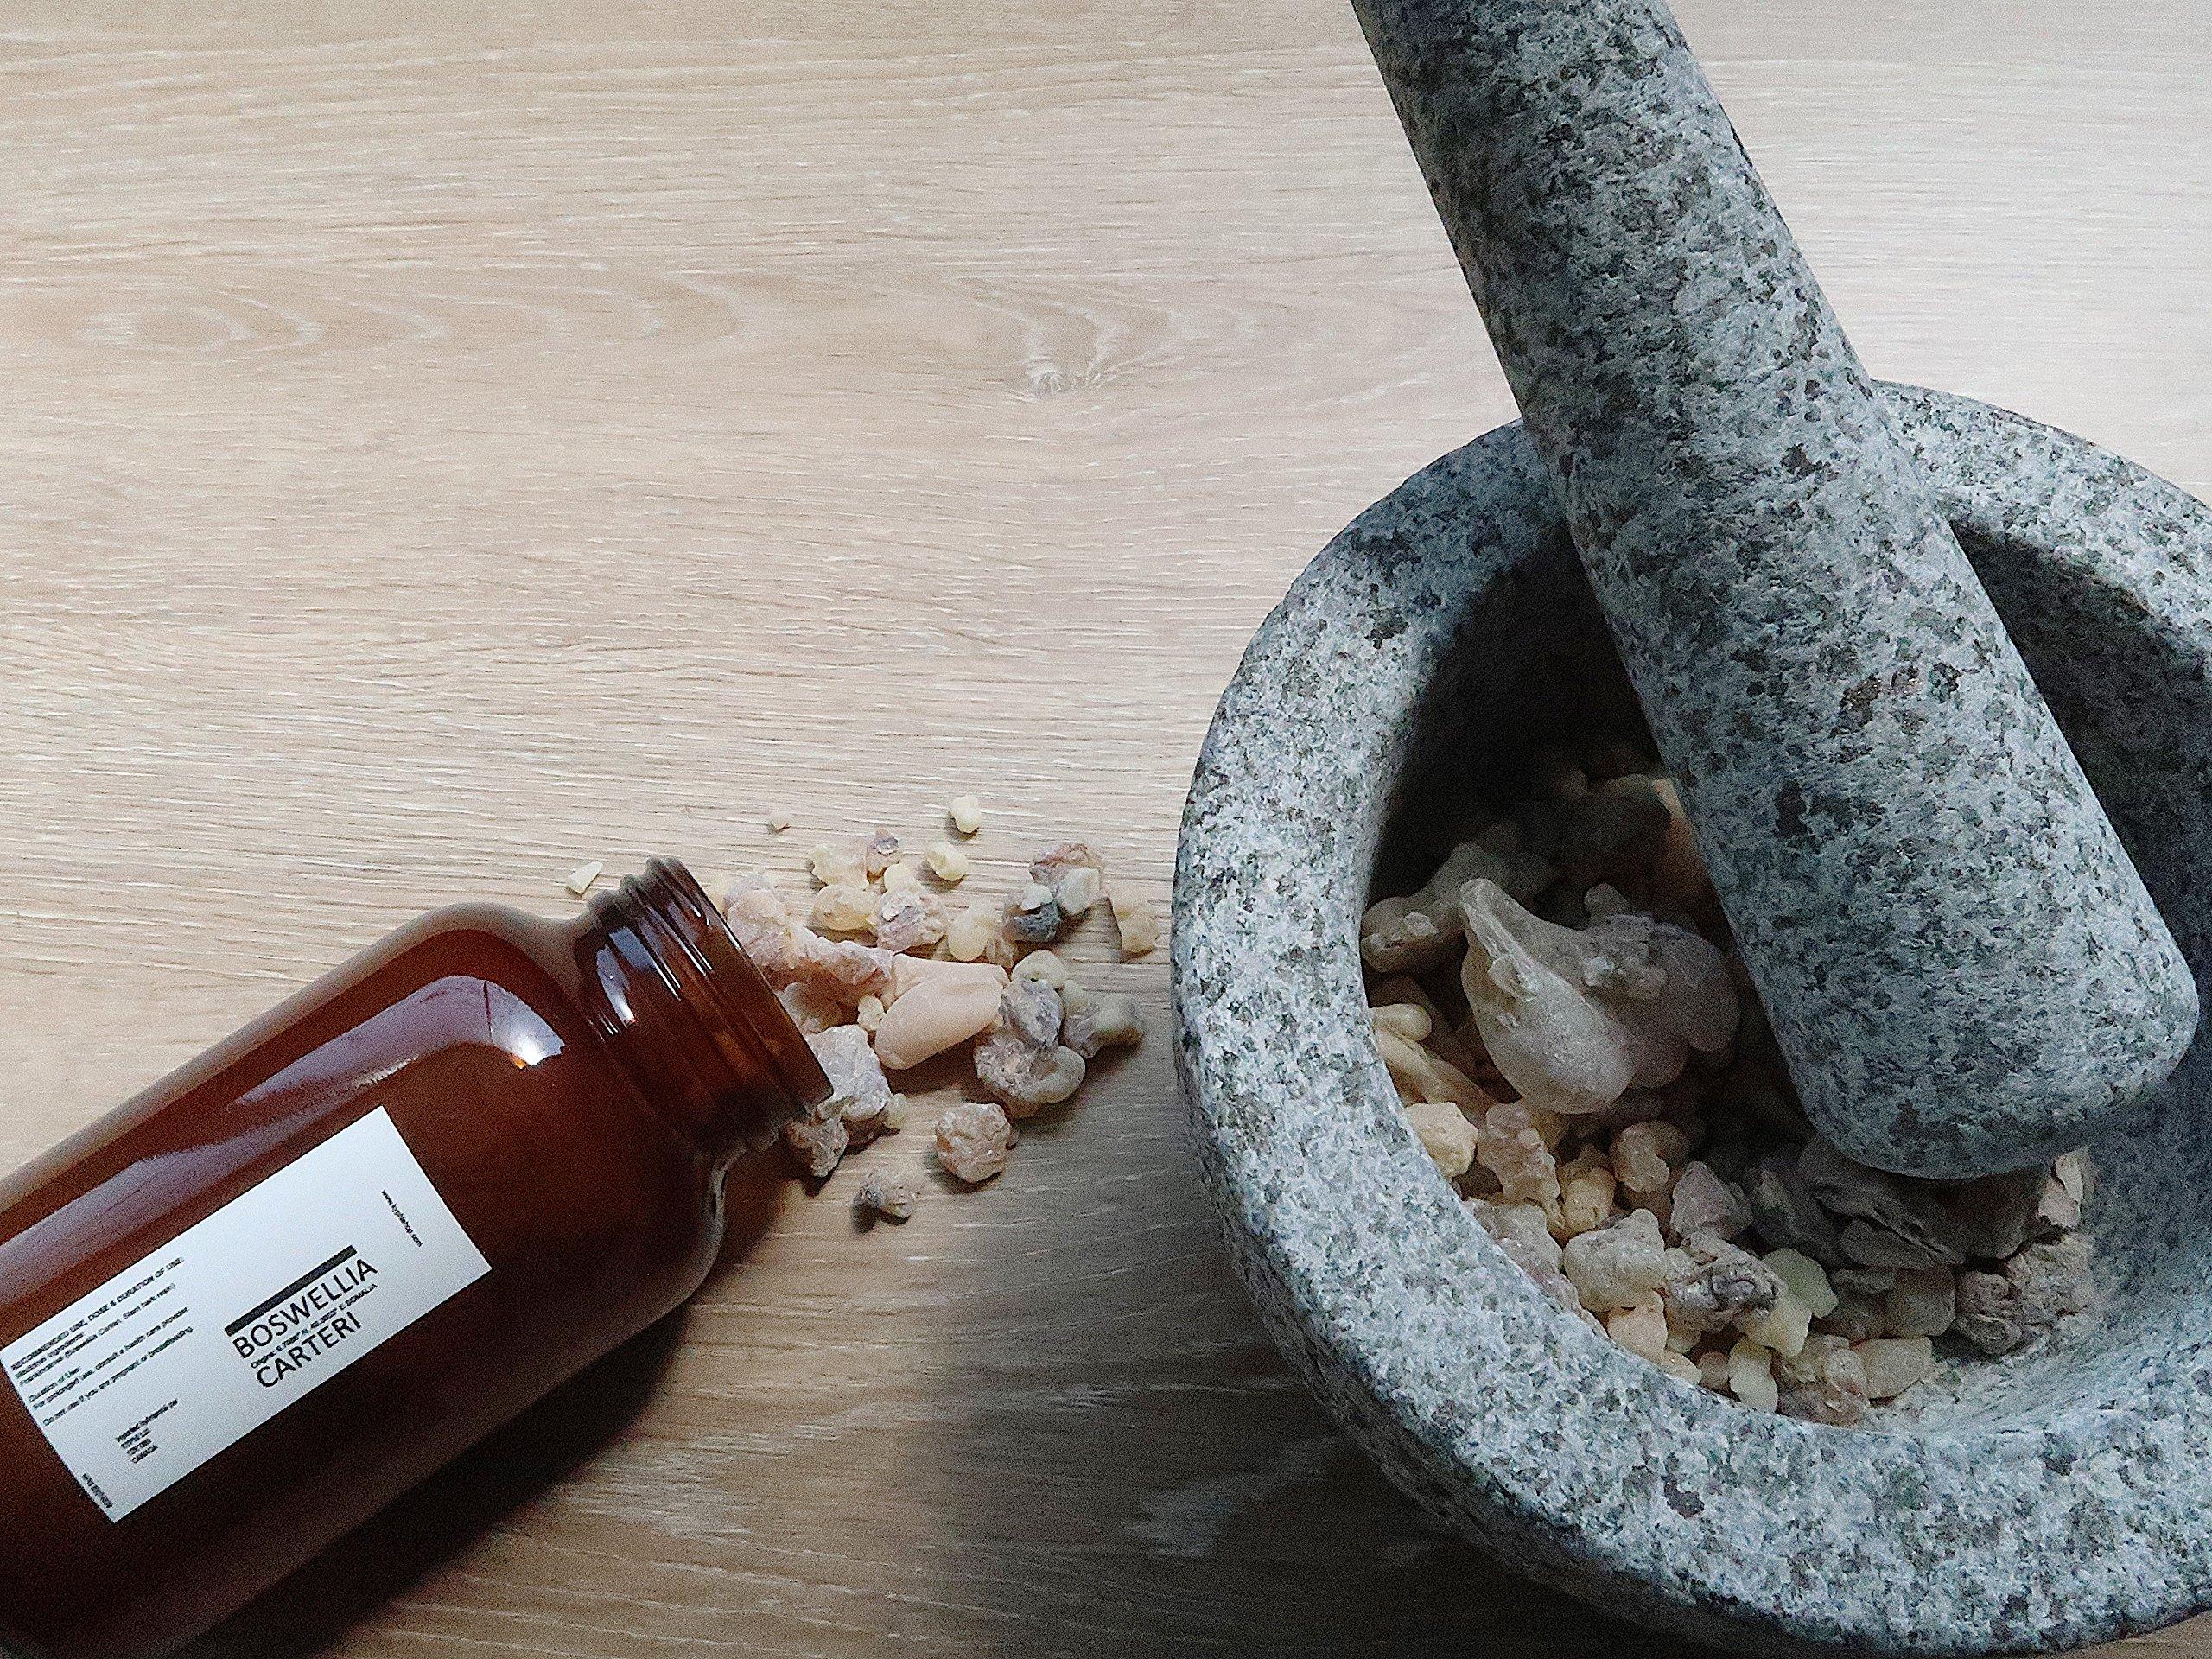 Kyphishop Wild Harvest Organic Frankincense Resins (Boswellia Carterii) Ethically Graded from Mountainous Somalia by Kyphishop (Image #4)